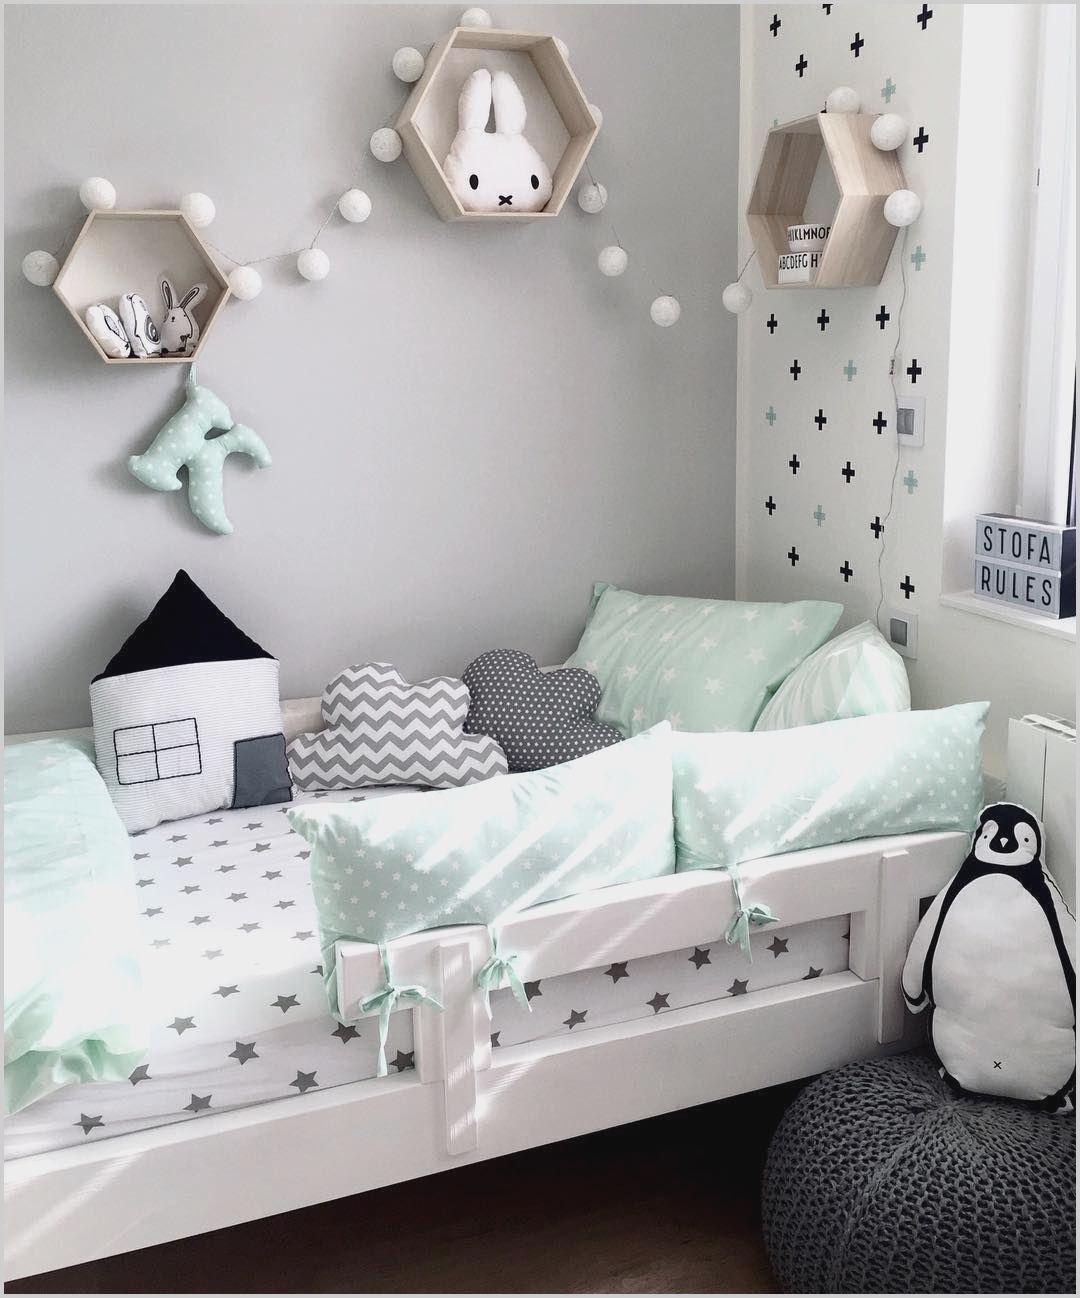 Pinterest Childrens Bedroom Ideas Toddler Bedrooms Baby Boy Bedroom Nursery Furniture Sets Toddler bedroom ideas pinterest